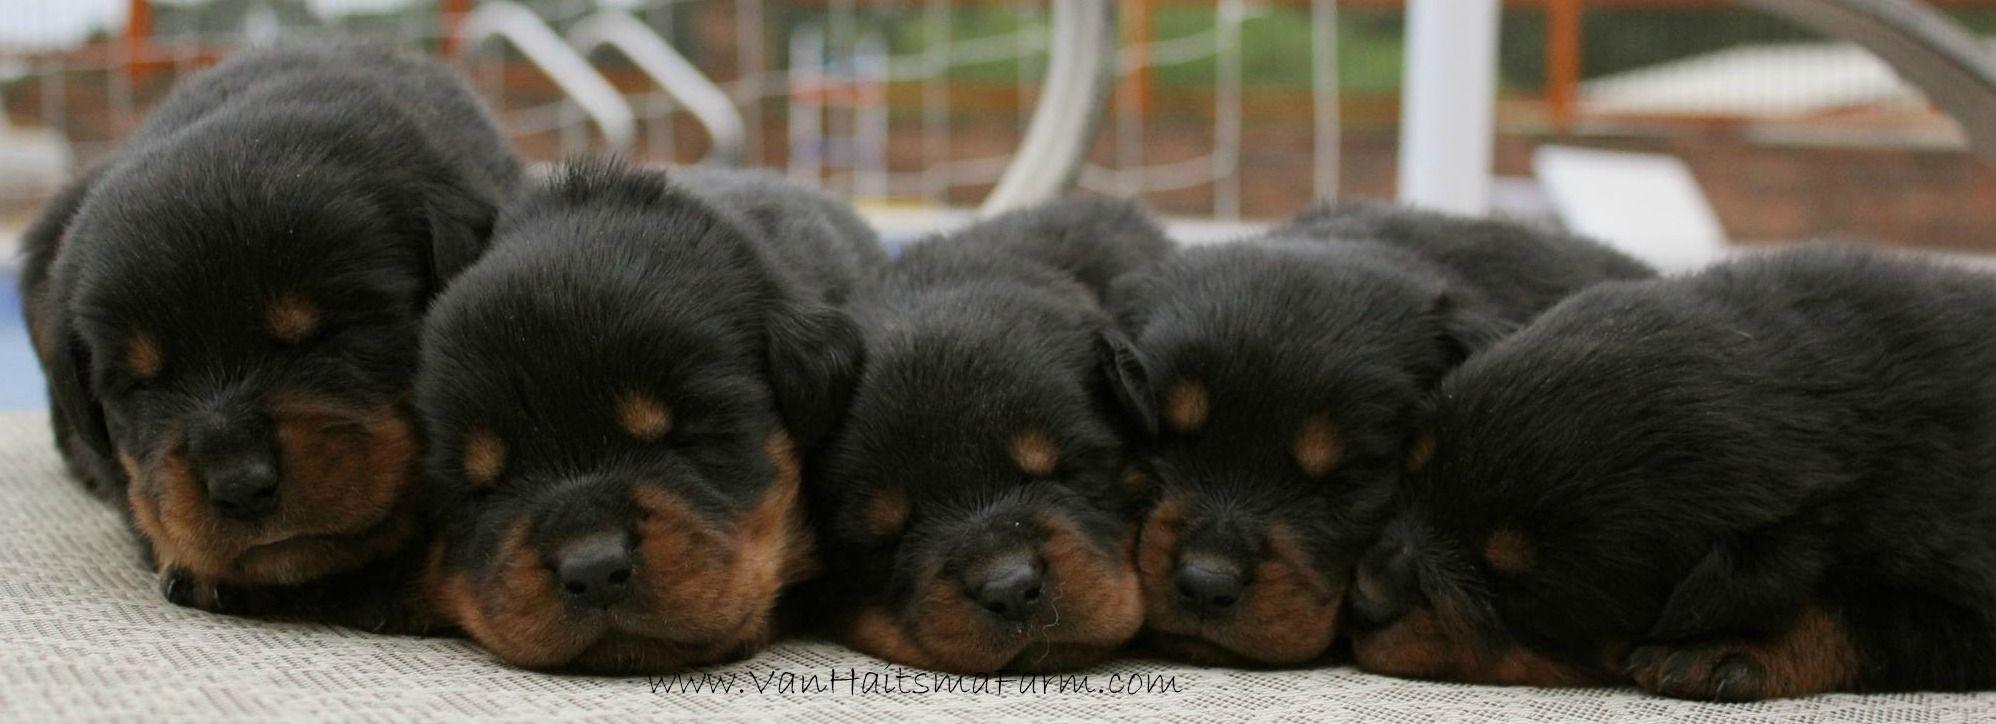 A Row Of Rottweiler Puppies Animals Friends